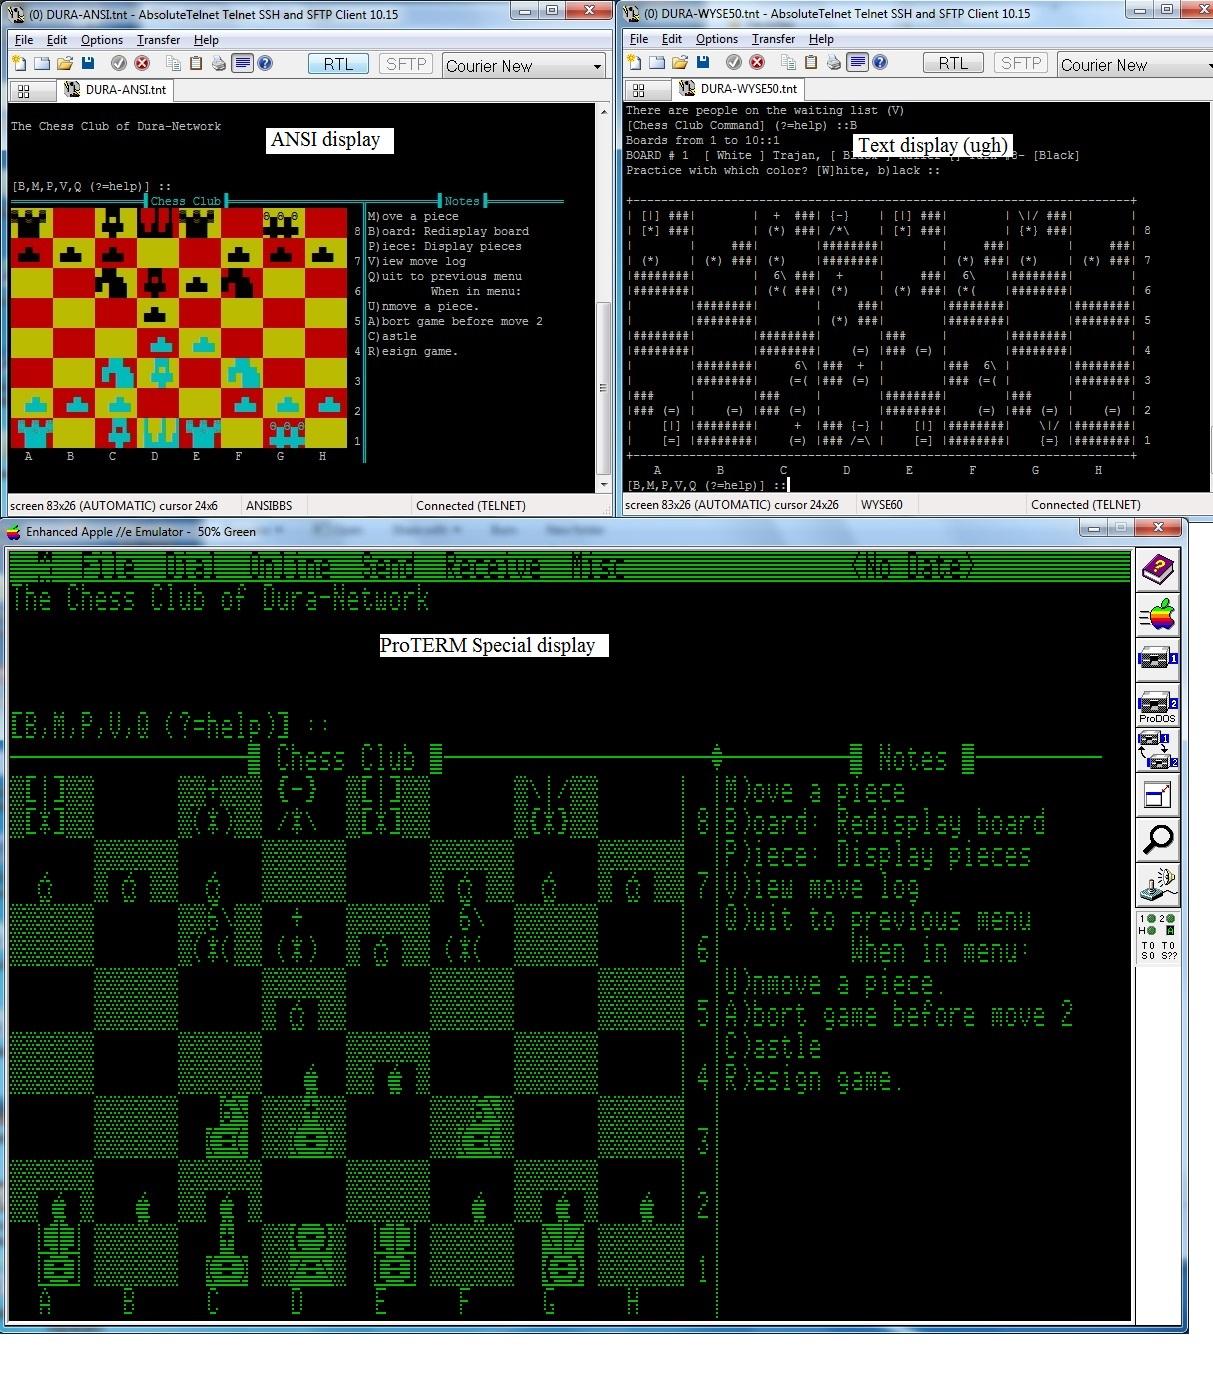 Chess Club screenshots on Dura-Network